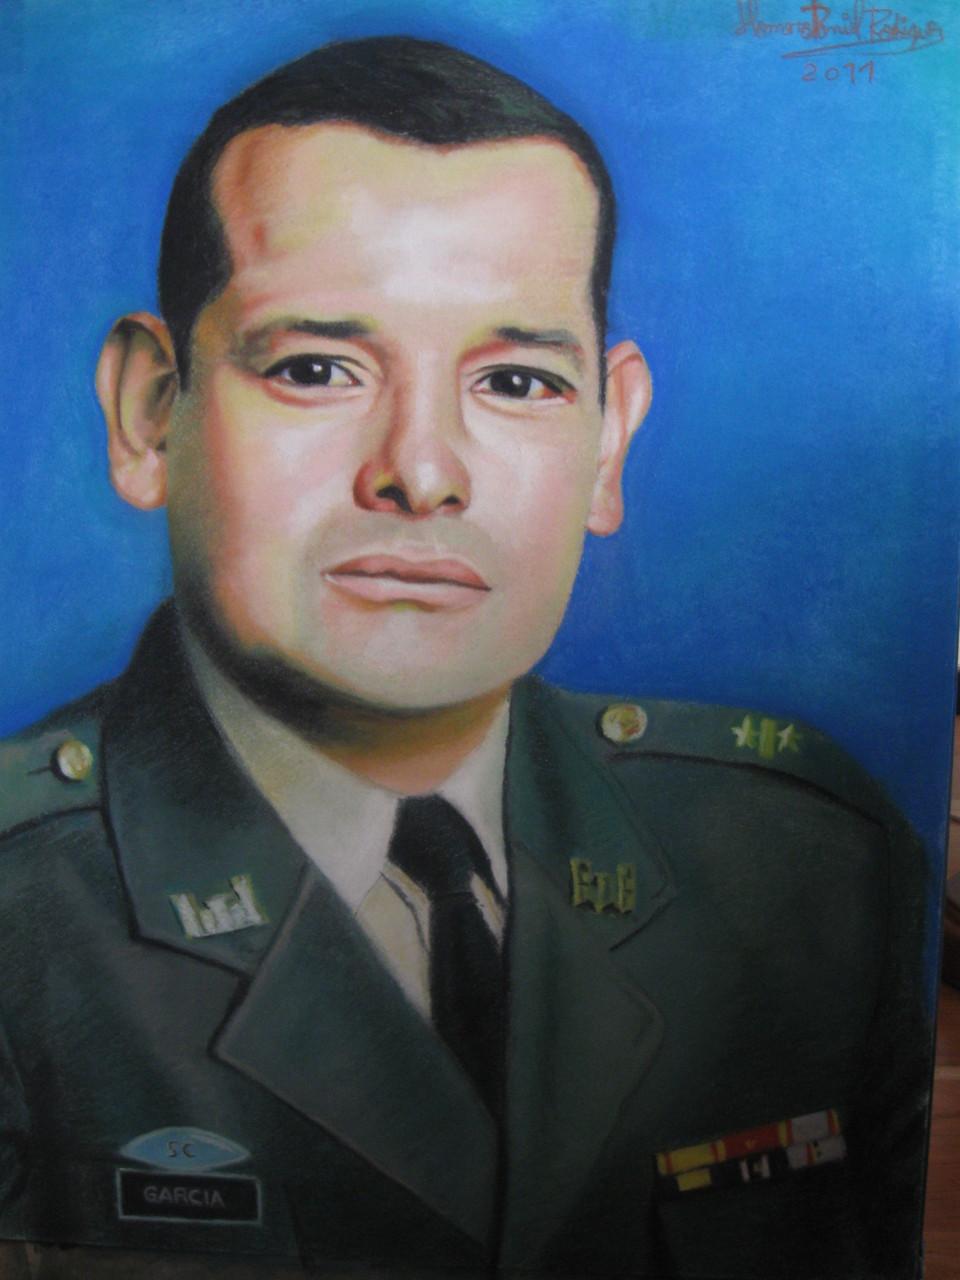 Teniente Coronel  (Soft Pastel)